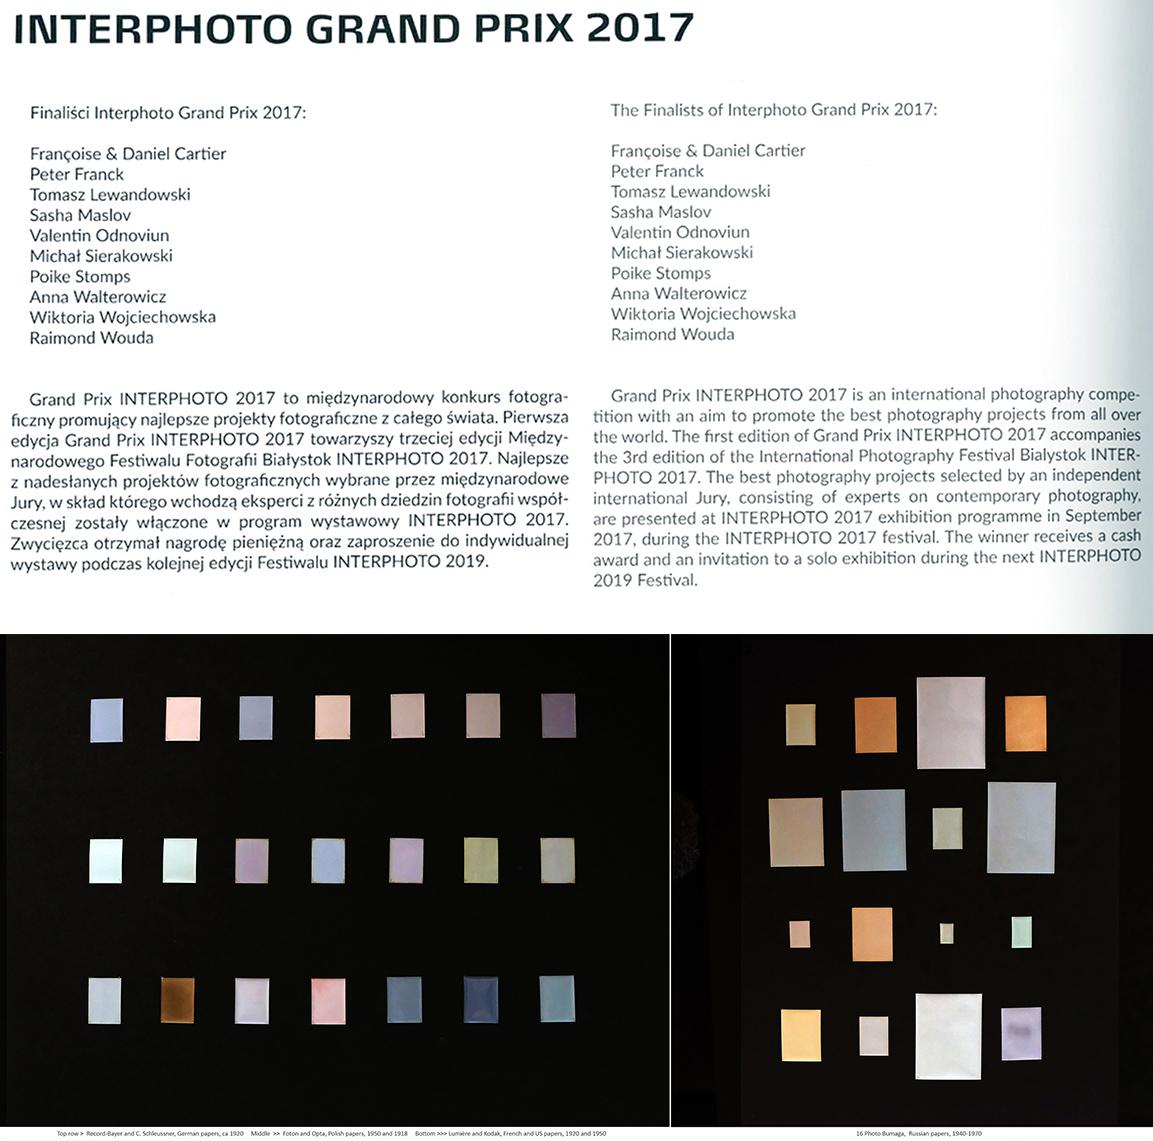 Bialystok Poland, First Interphoto Grand Prix 2017, F&D finalists.